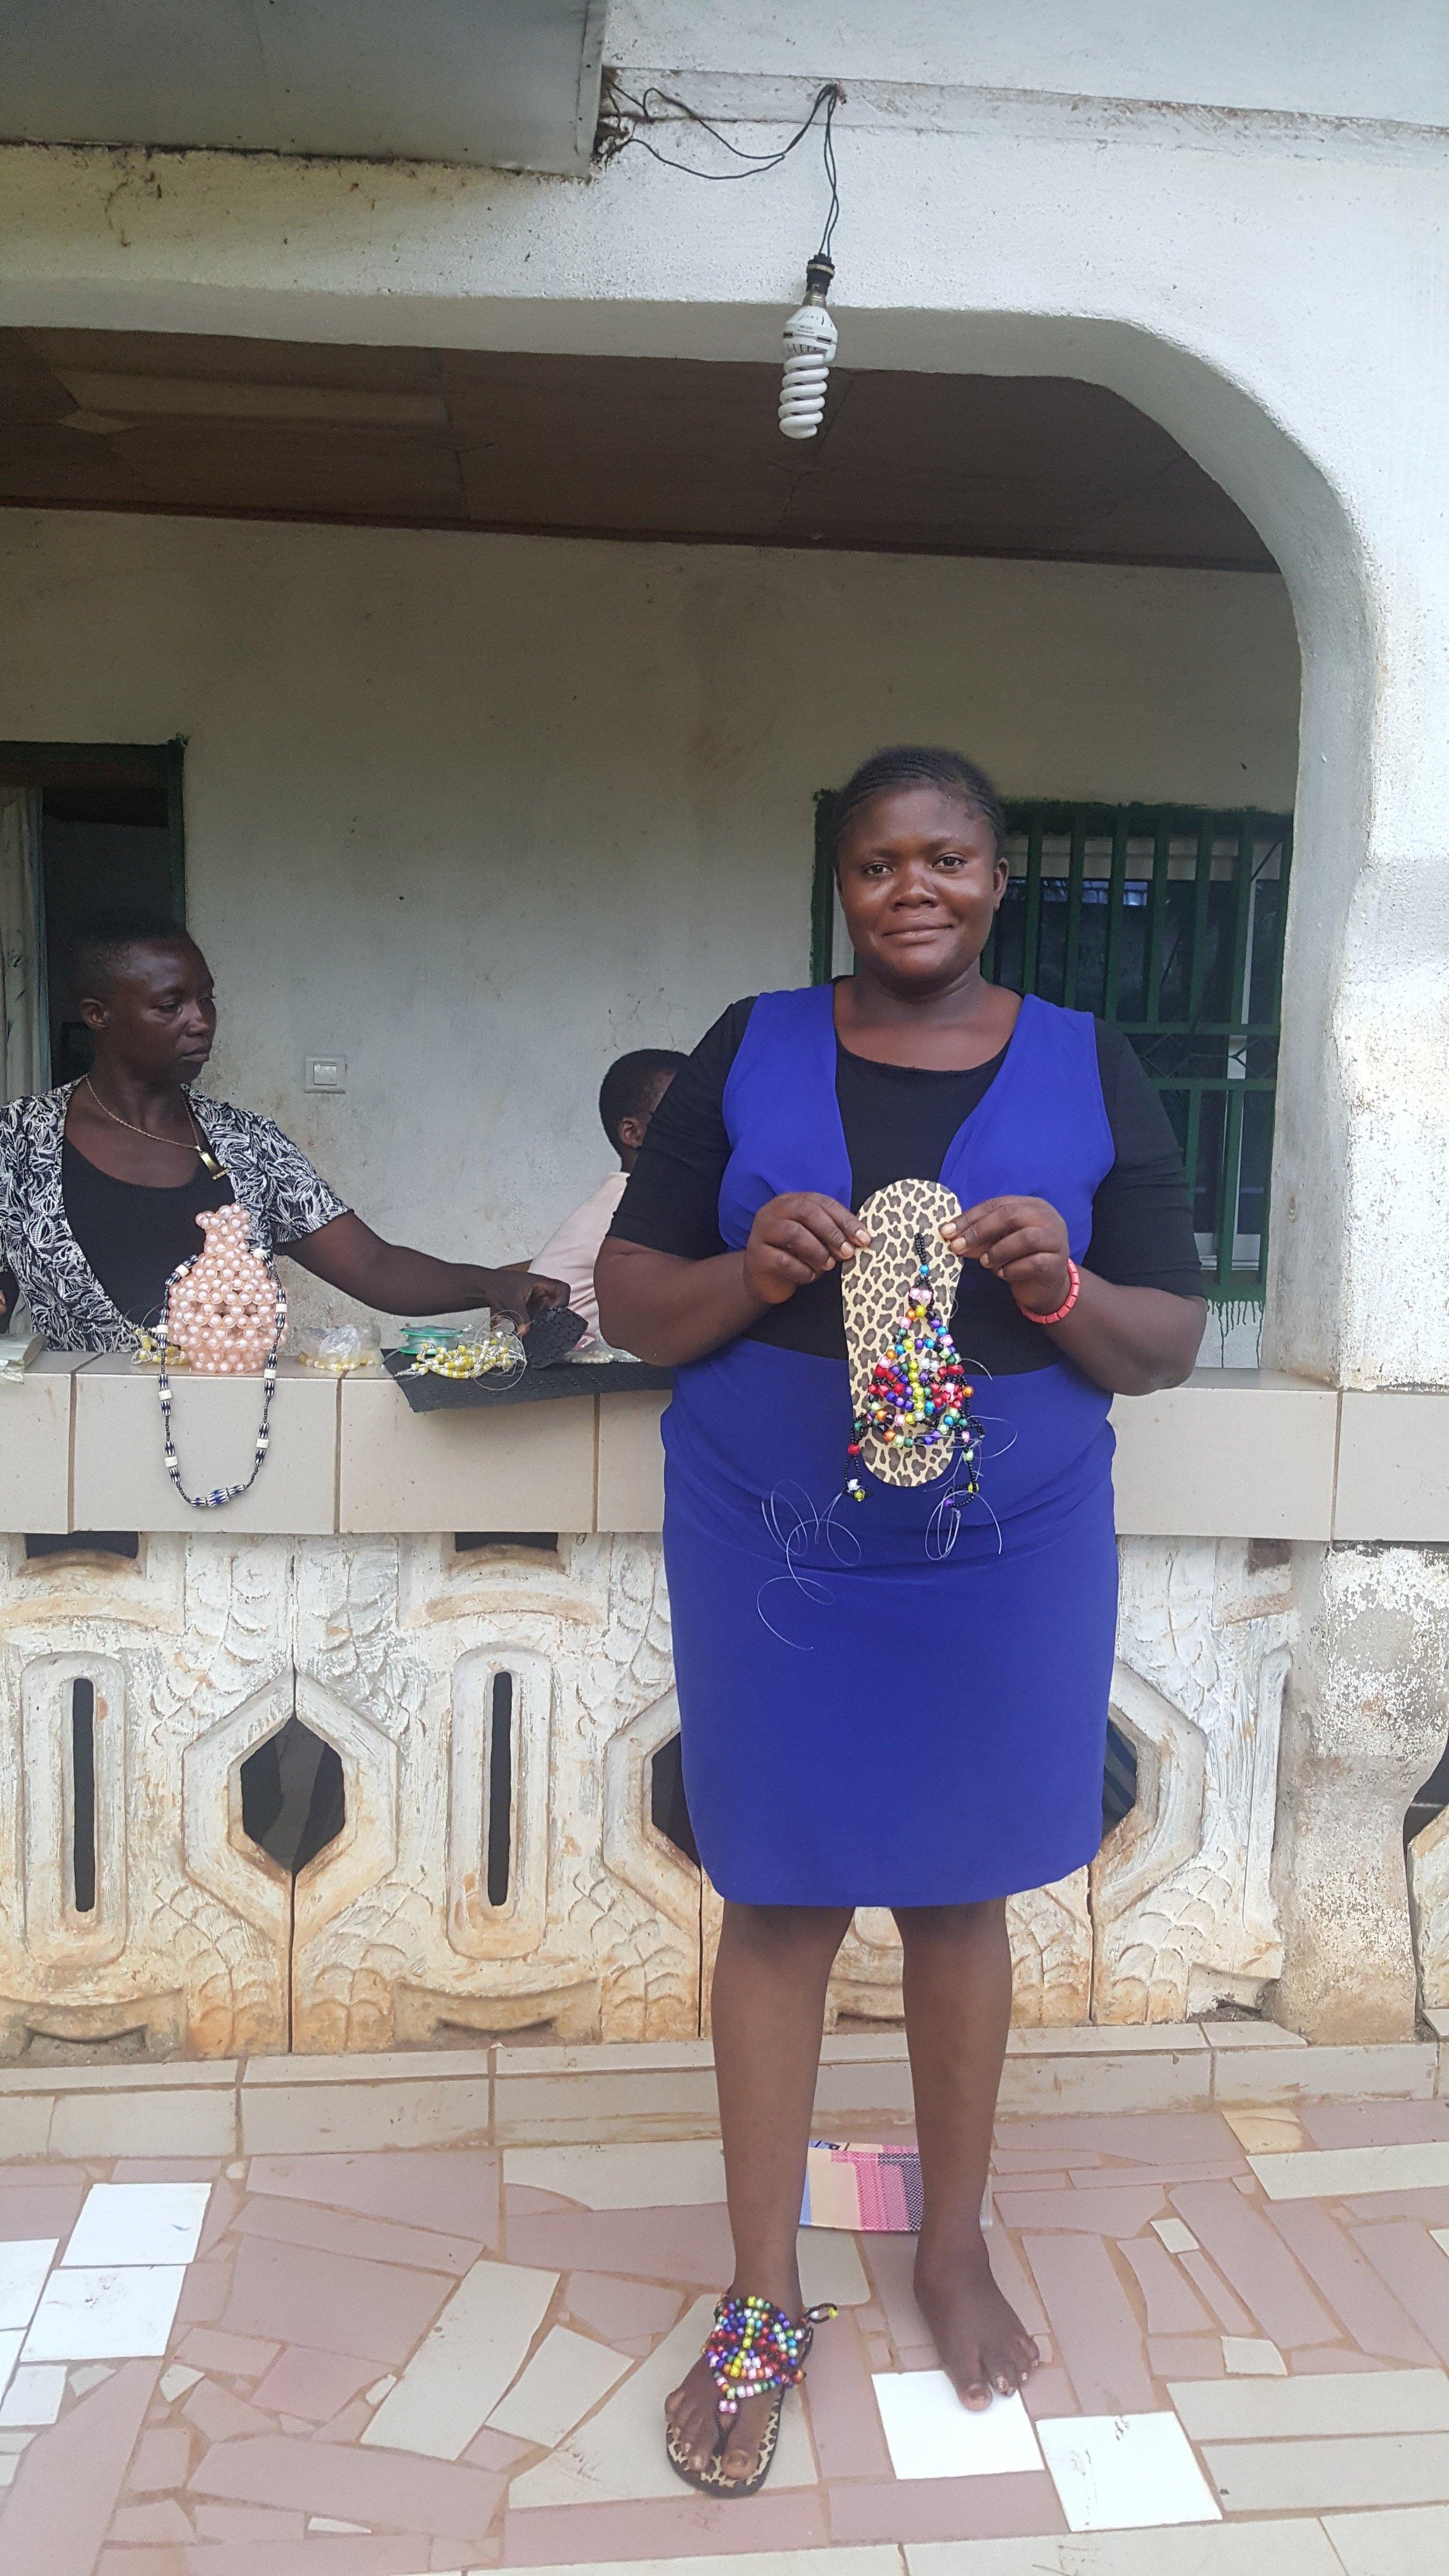 Diana, 34, Treasurer of her Group